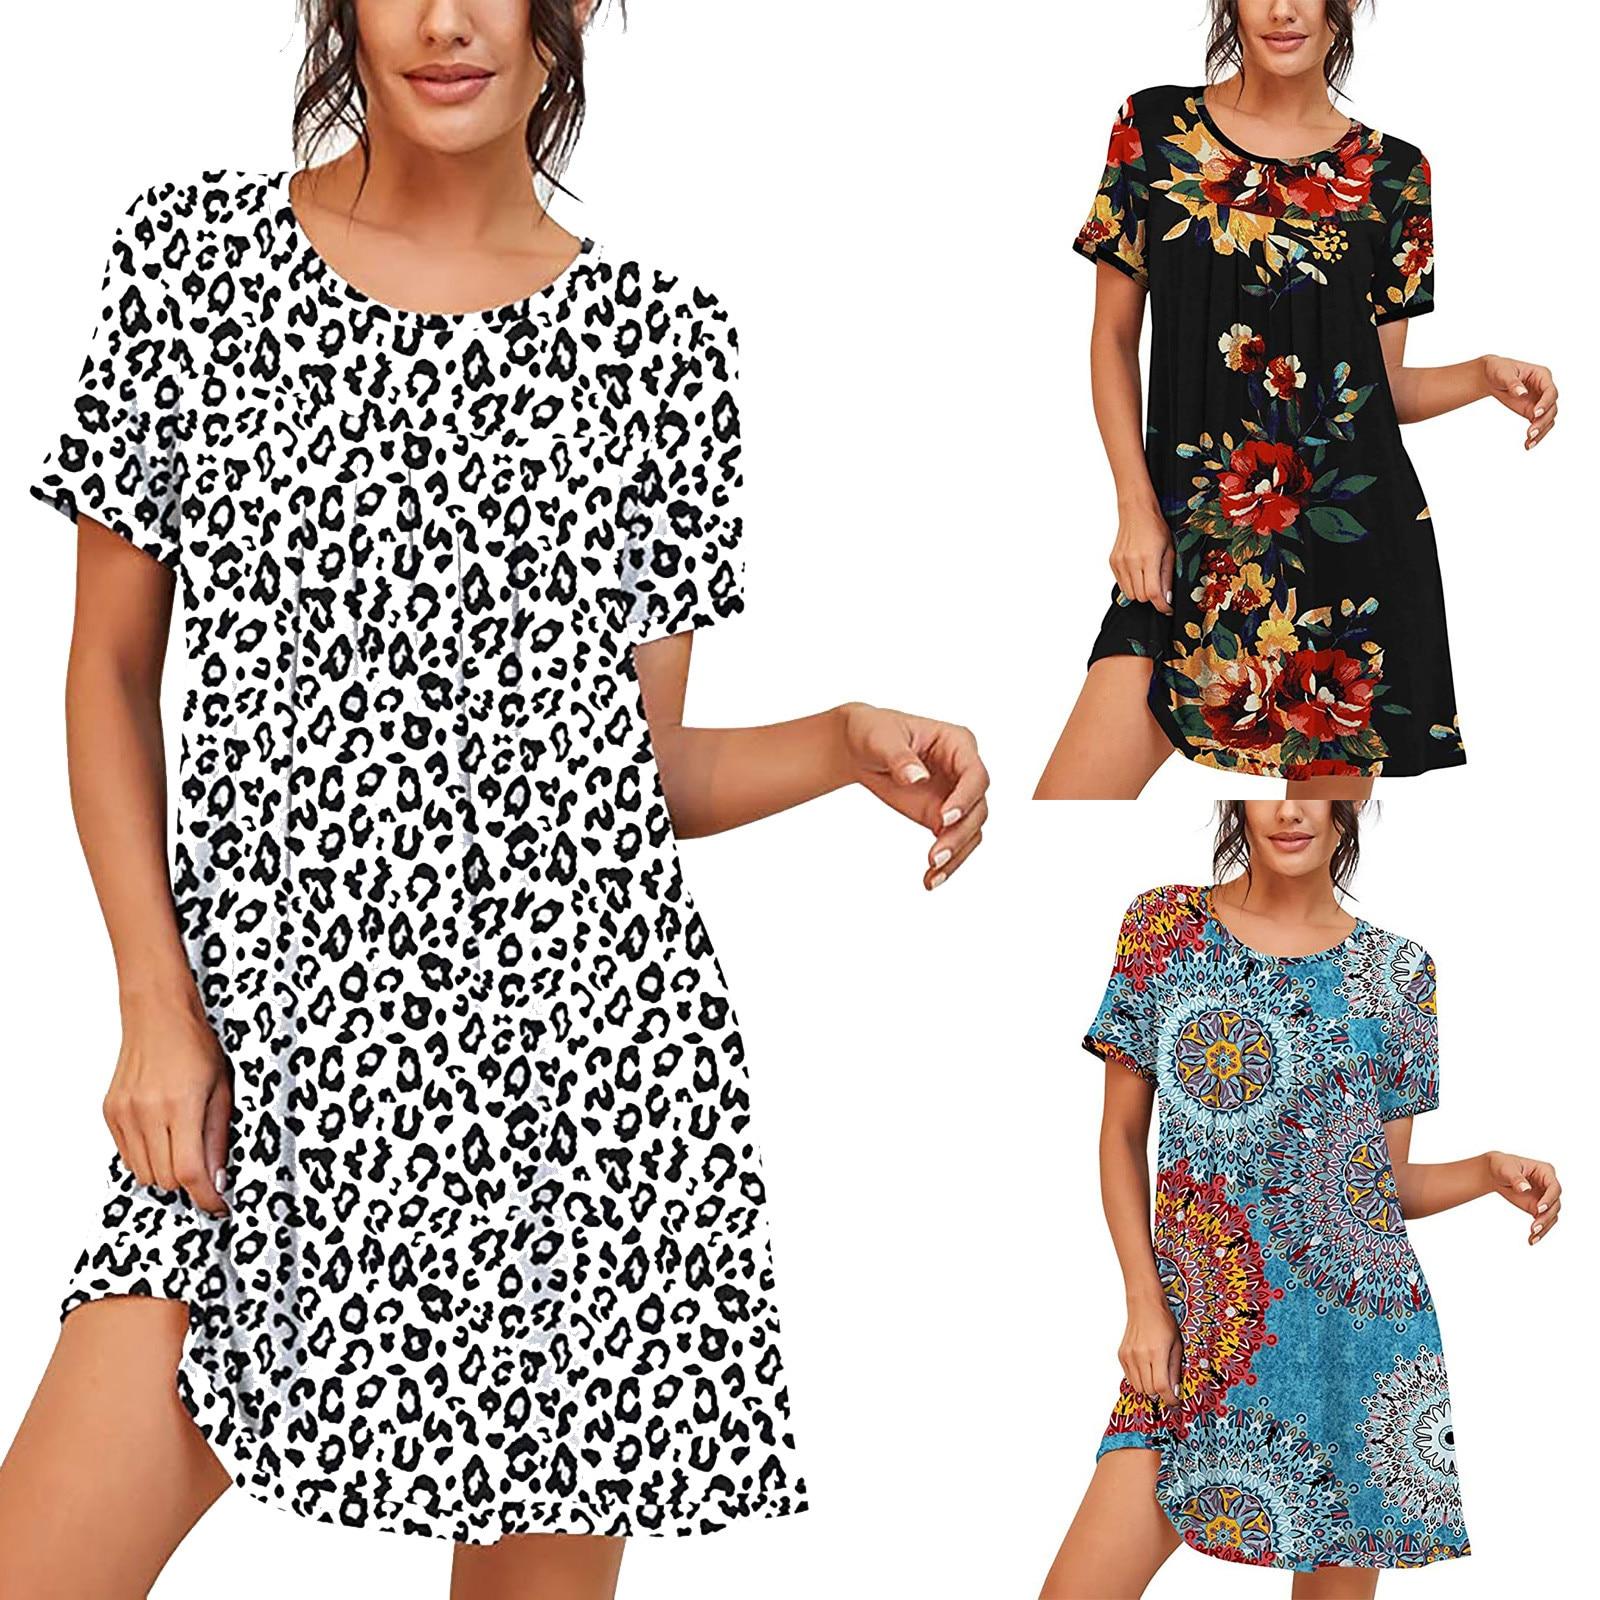 Women's dress home color matching large size round neck irregular short-sleeved dress V-neck short-sleeved платье женское 40*